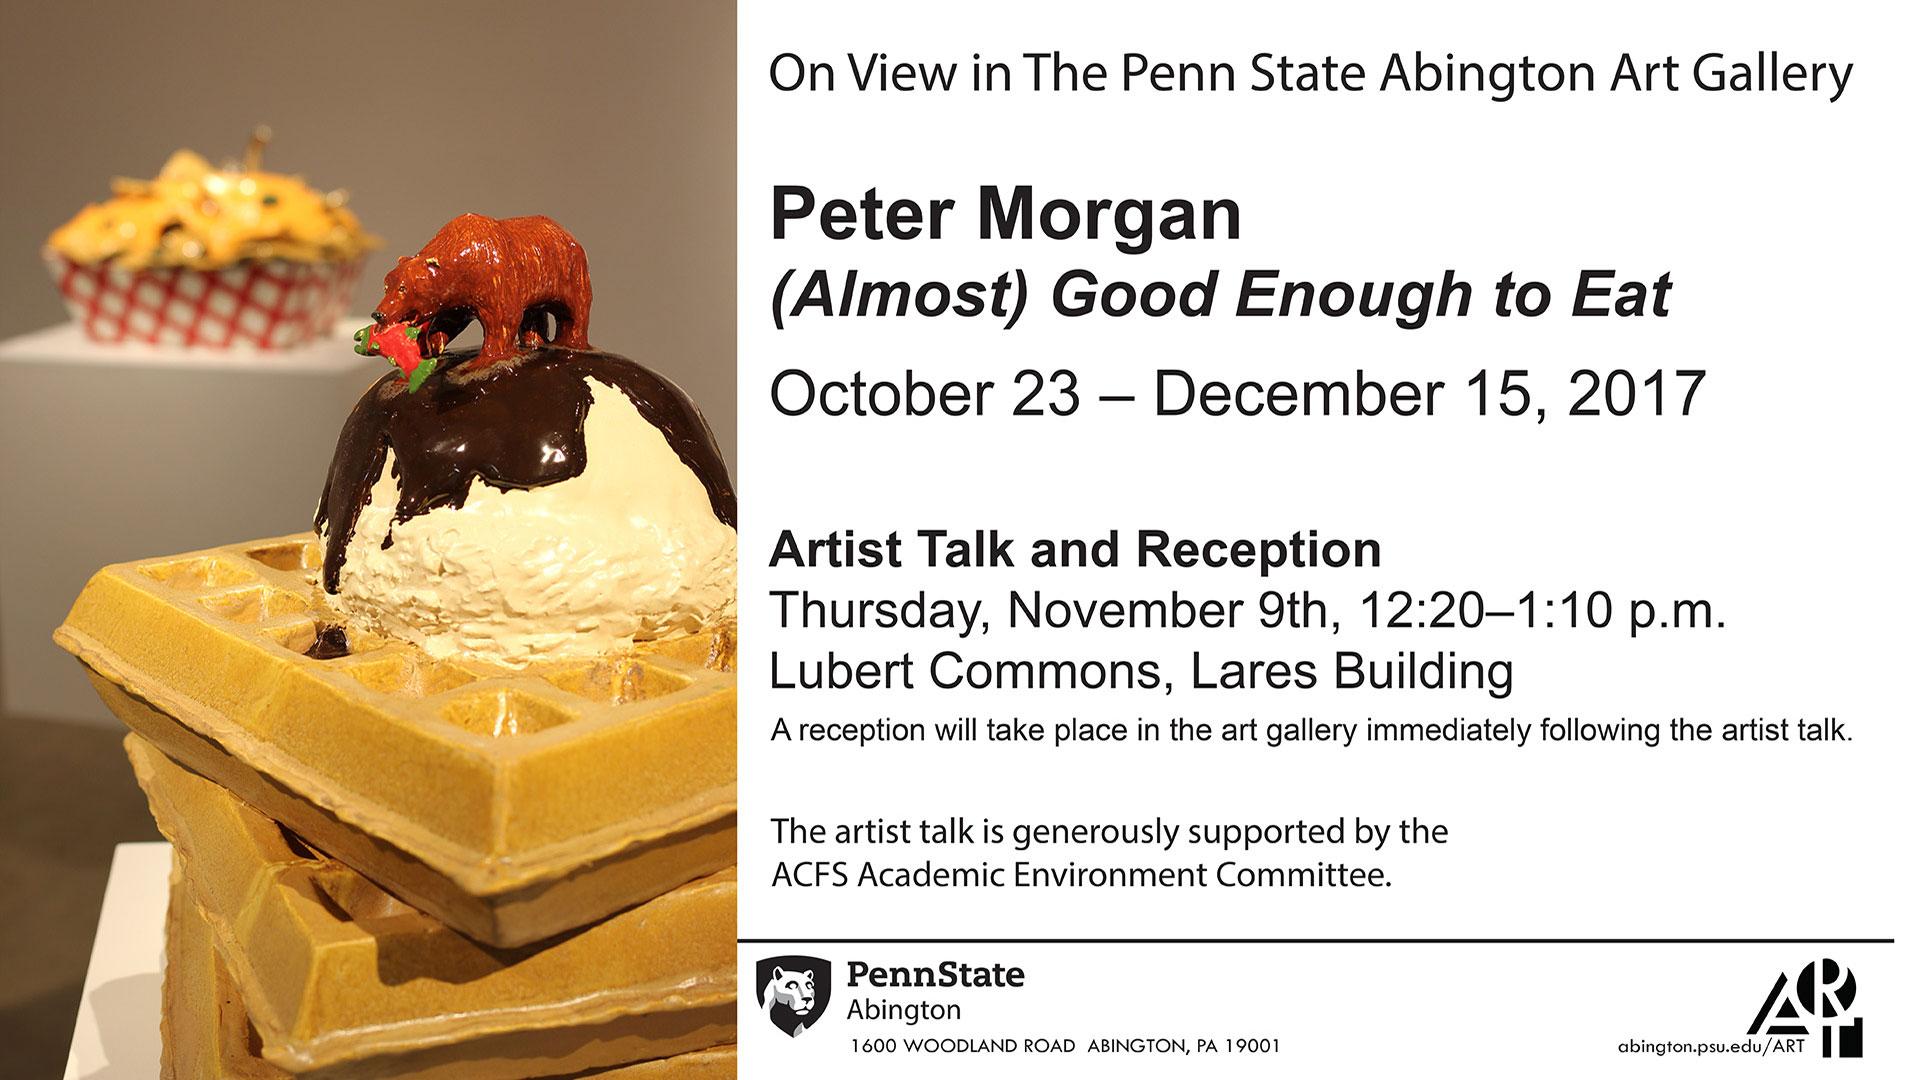 Peter Morgan Almost Good Enough To Eat Penn State Abington